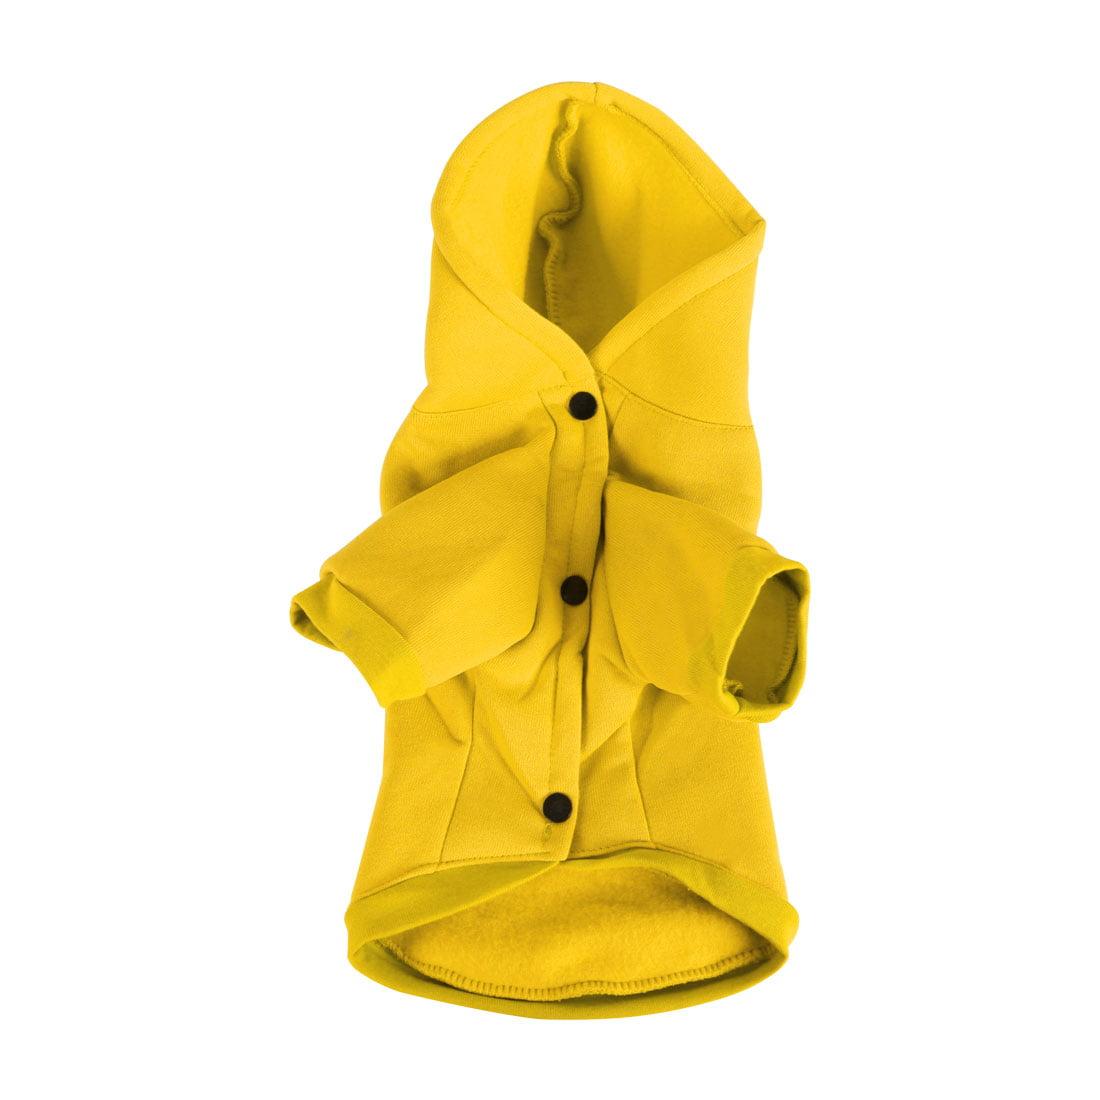 Cotton Dog Sweatshirt Hooded Pet Clothes Fleece Lined w Pocket Yellow XXL